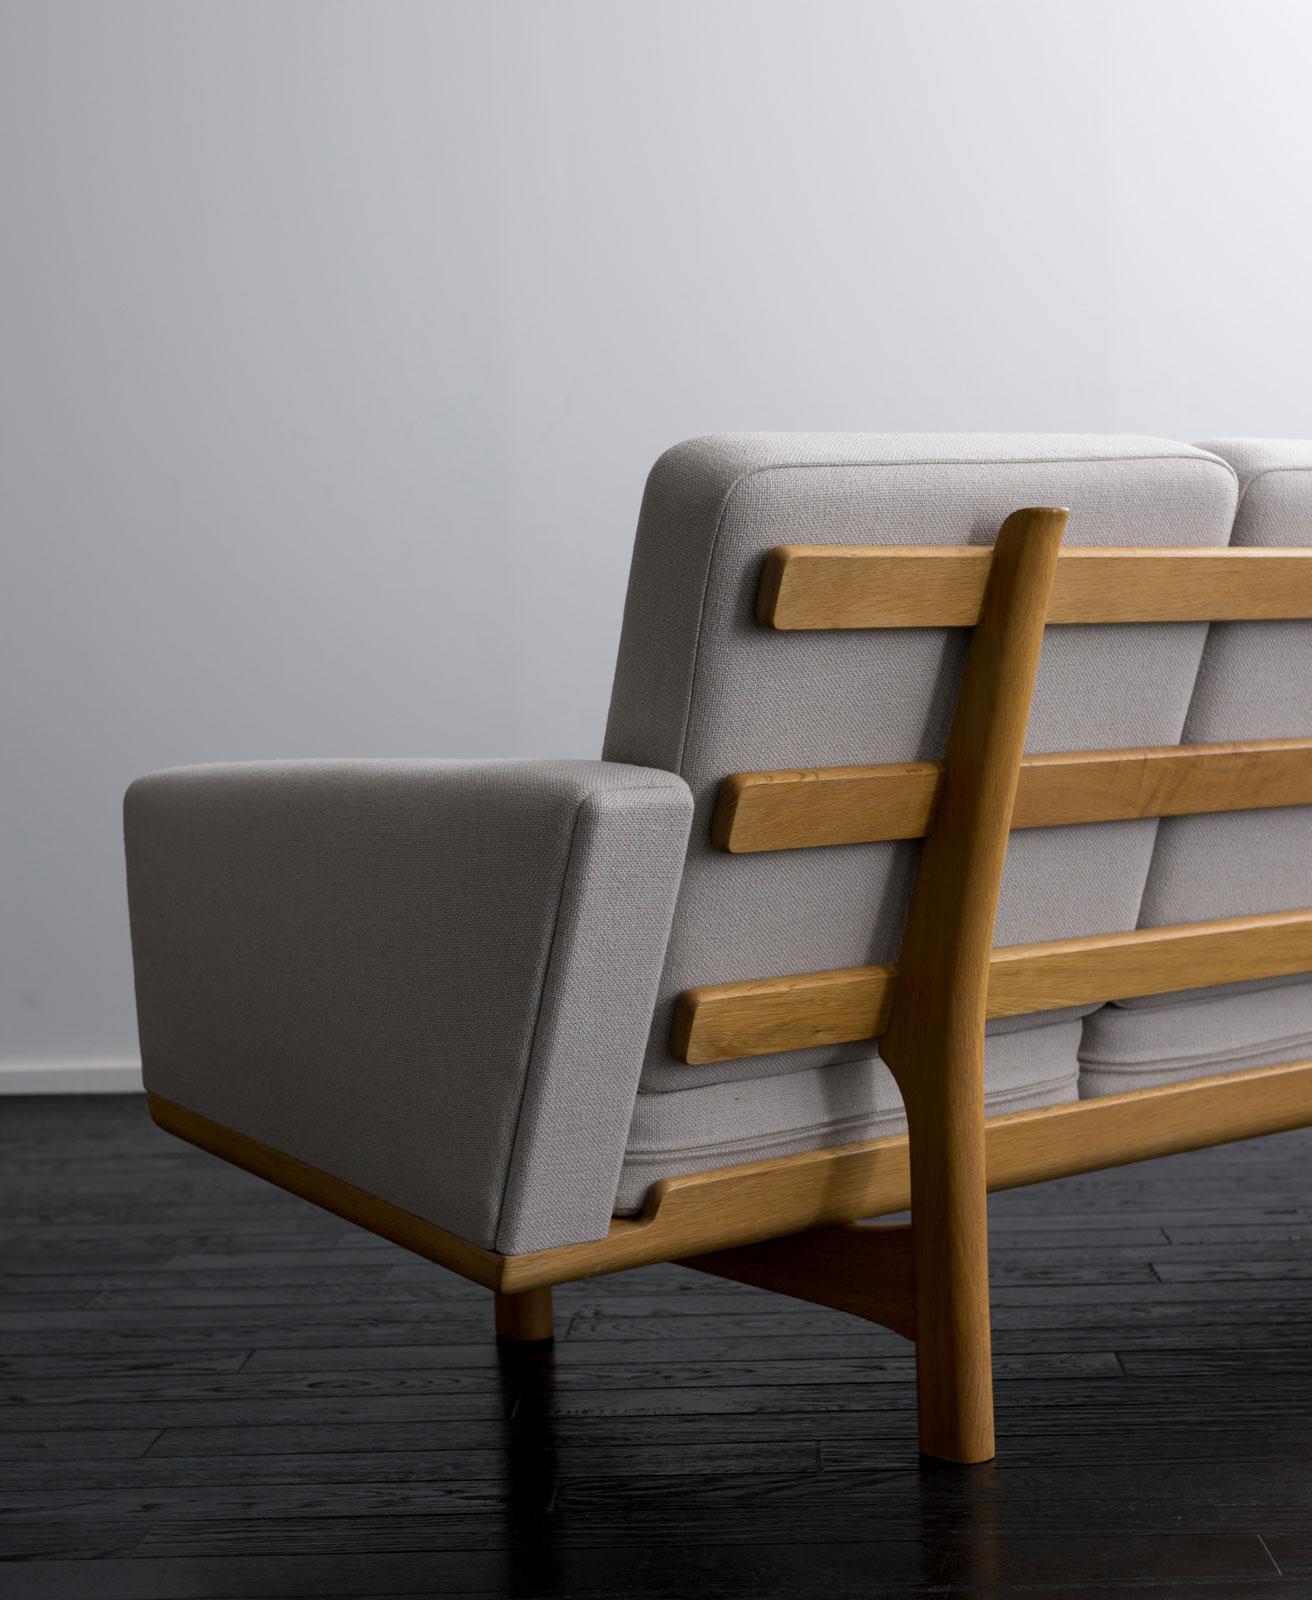 GE236 Sofa by Hans J Wegner